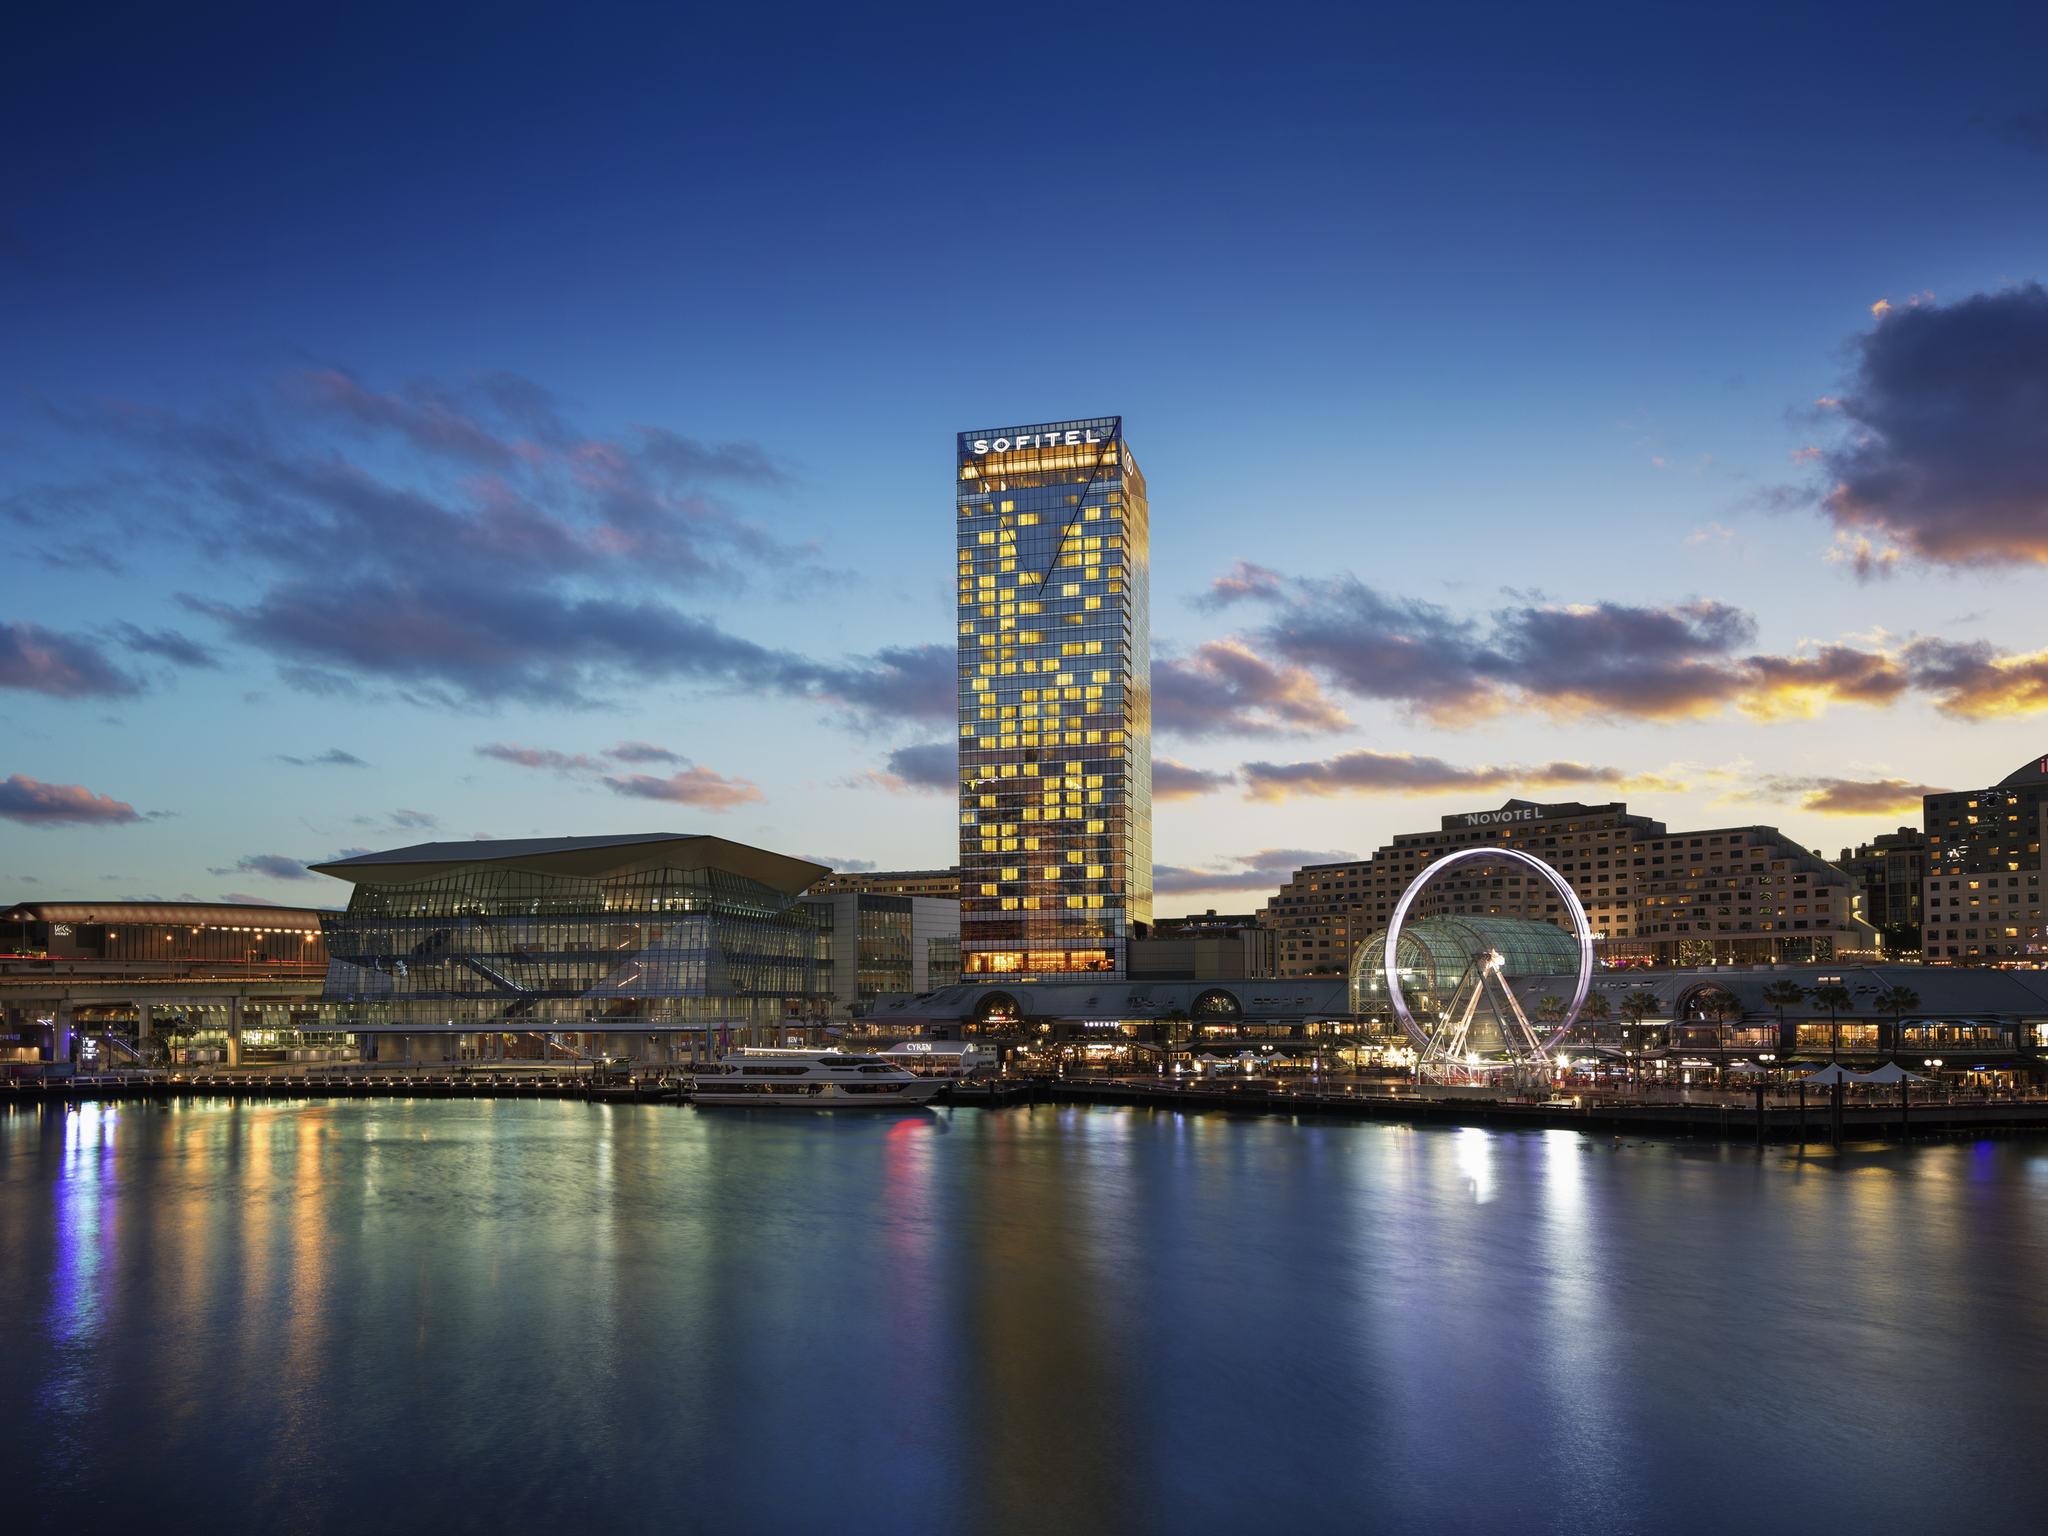 Hôtel - Sofitel Sydney Darling Harbour